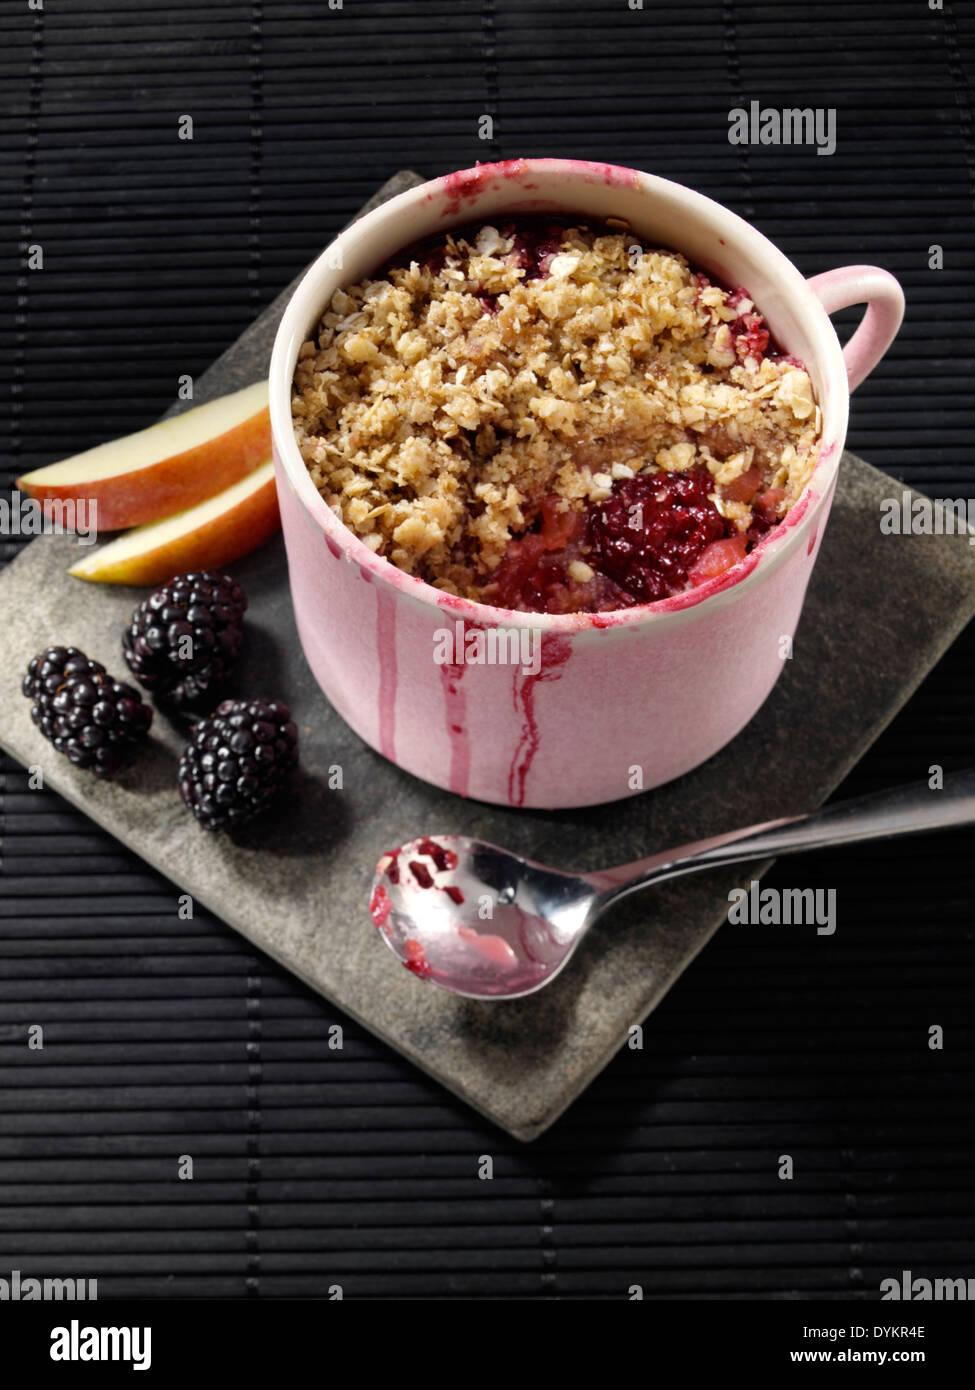 Microwaved apple crumble in a mug - Stock Image